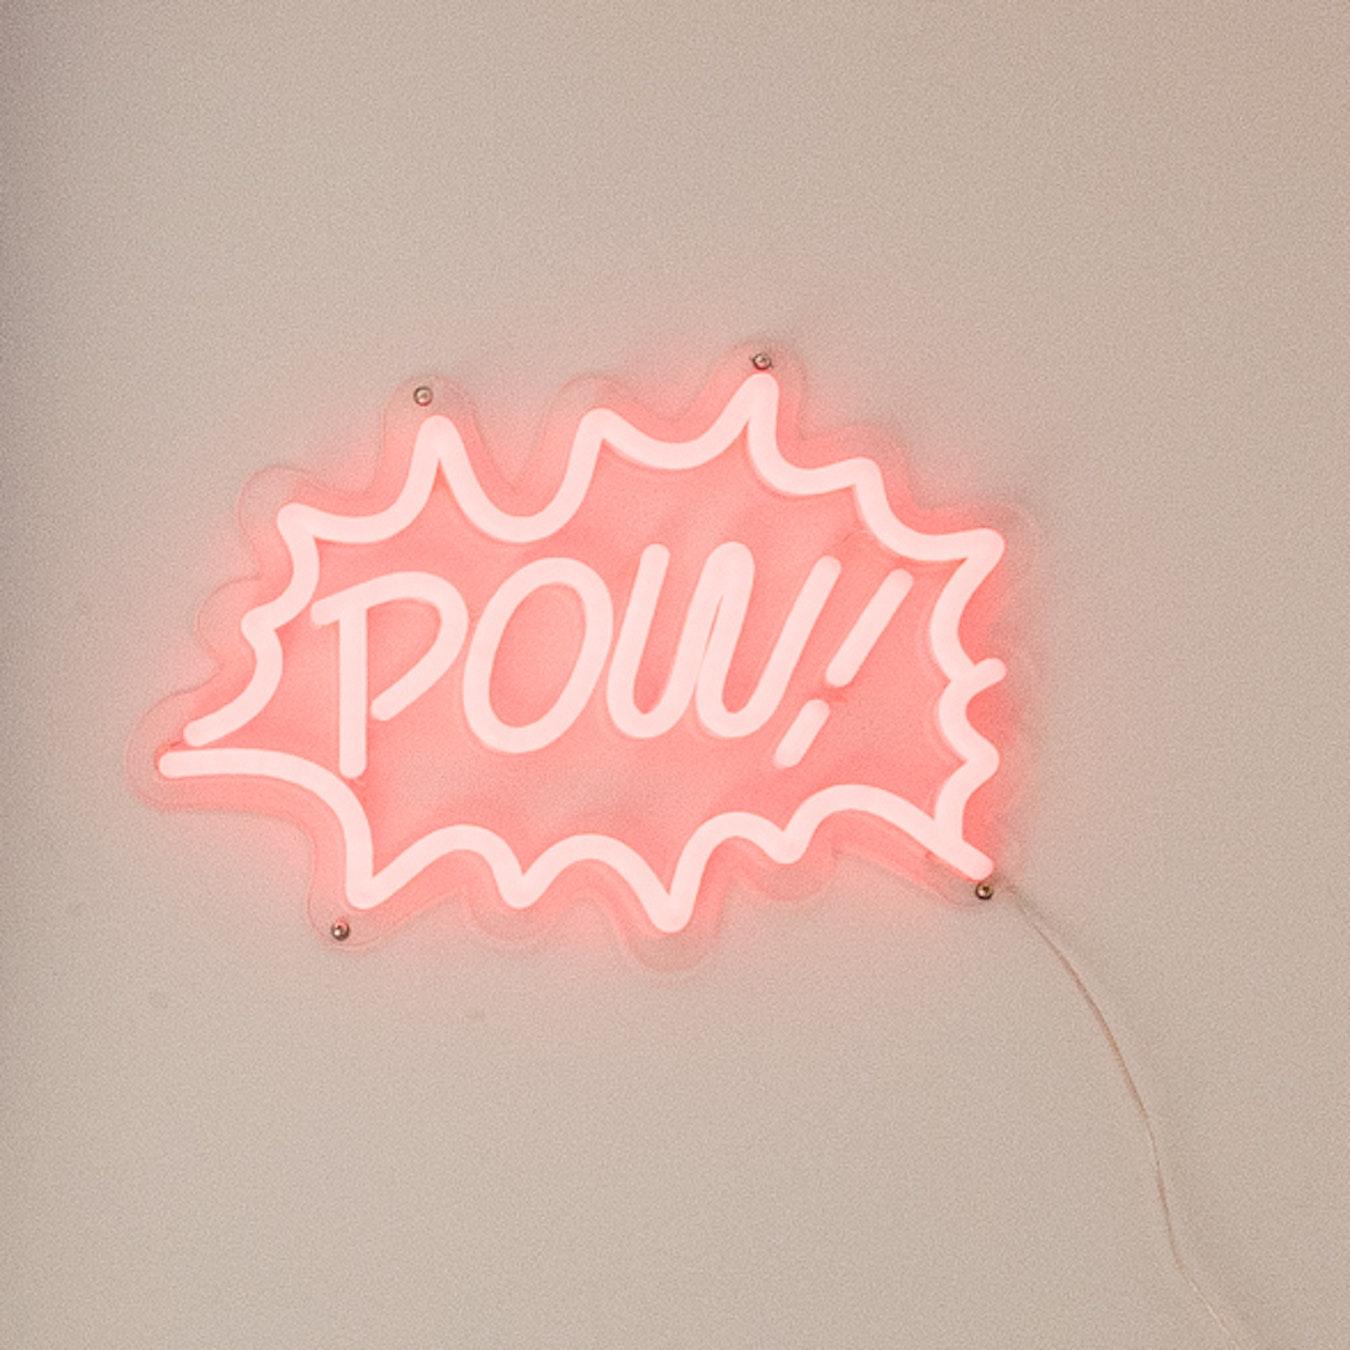 POW LED Neon Light